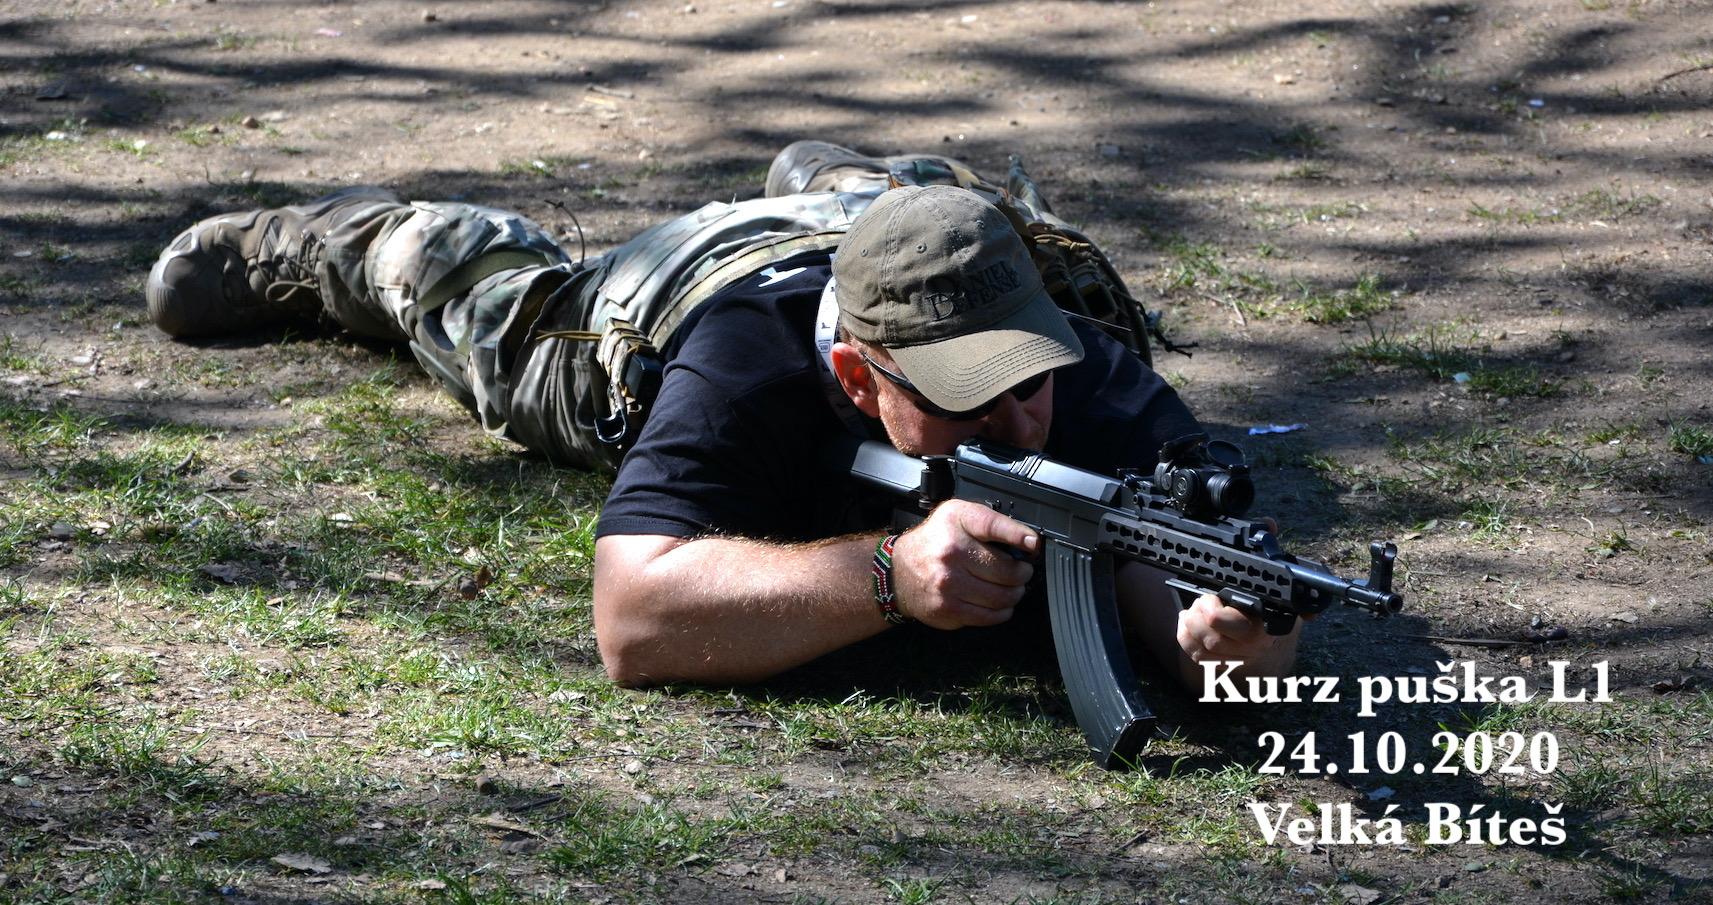 Kurz puška L1 dne 24.10.2020